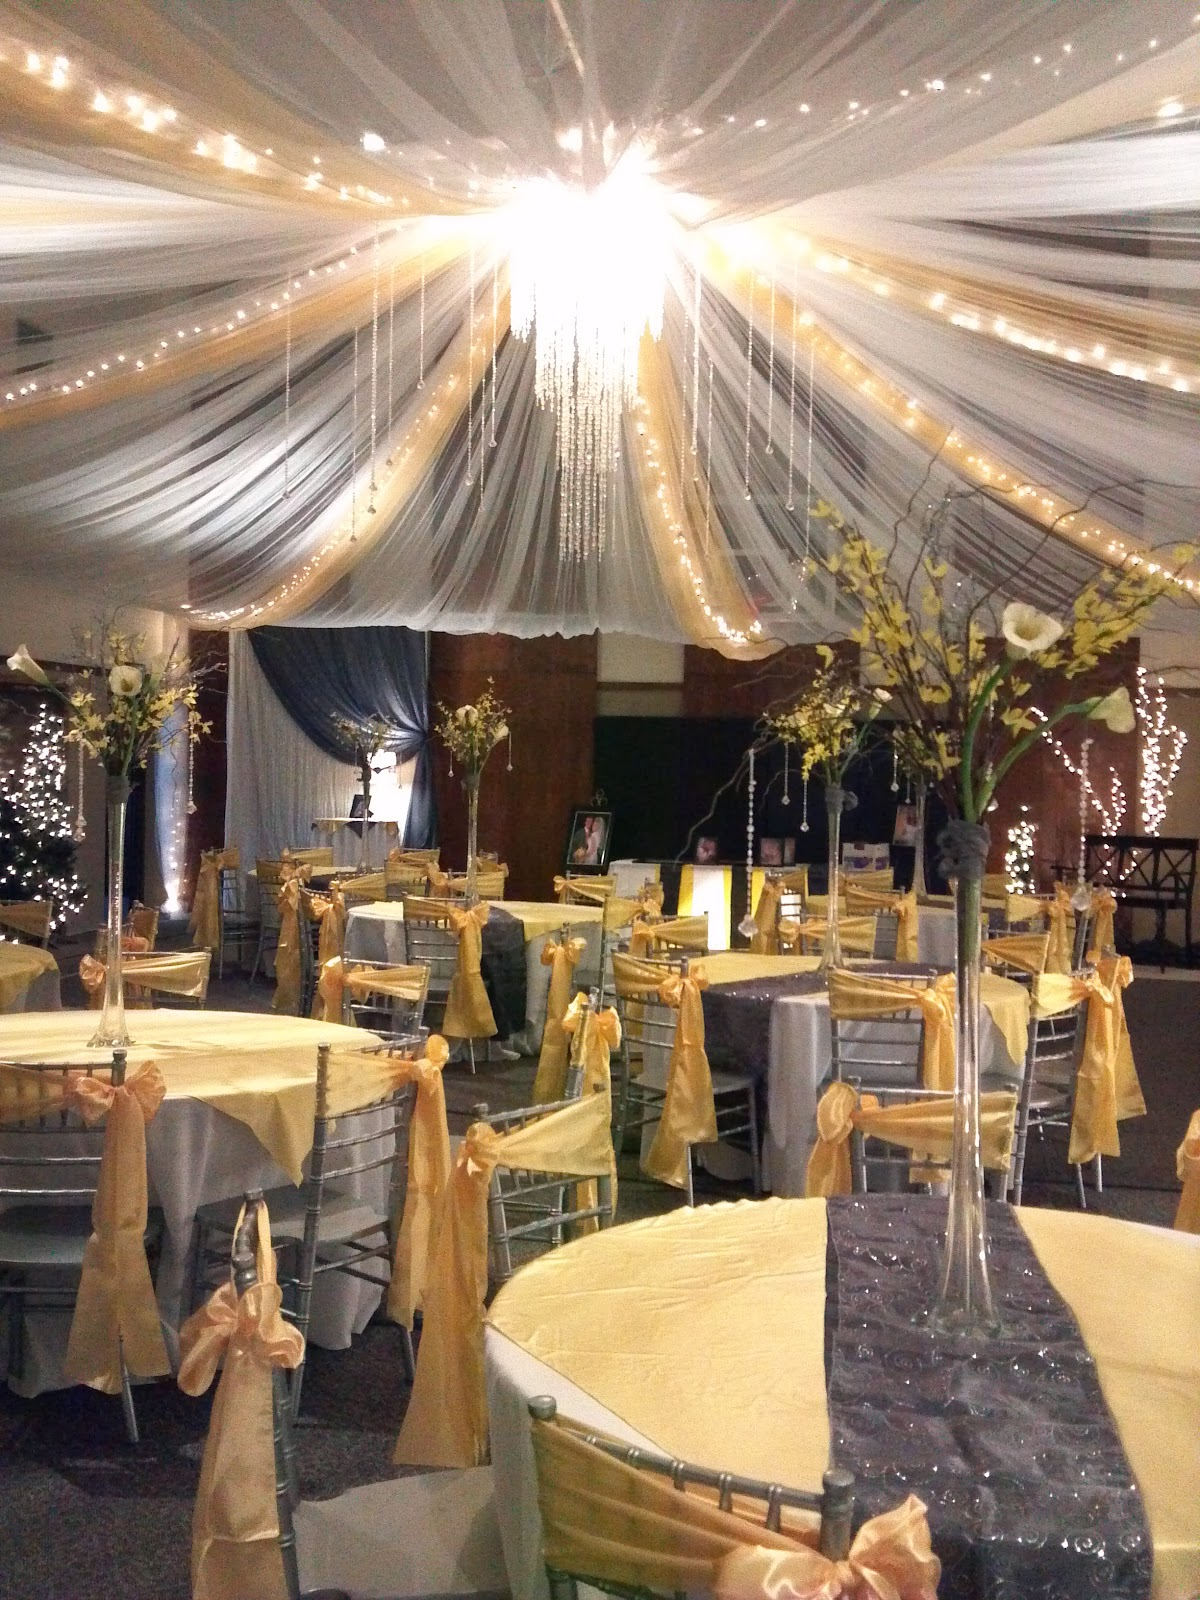 Best of church wedding reception decorations wedding lds wedding reception ideas gallery wedding decoration ideas junglespirit Gallery